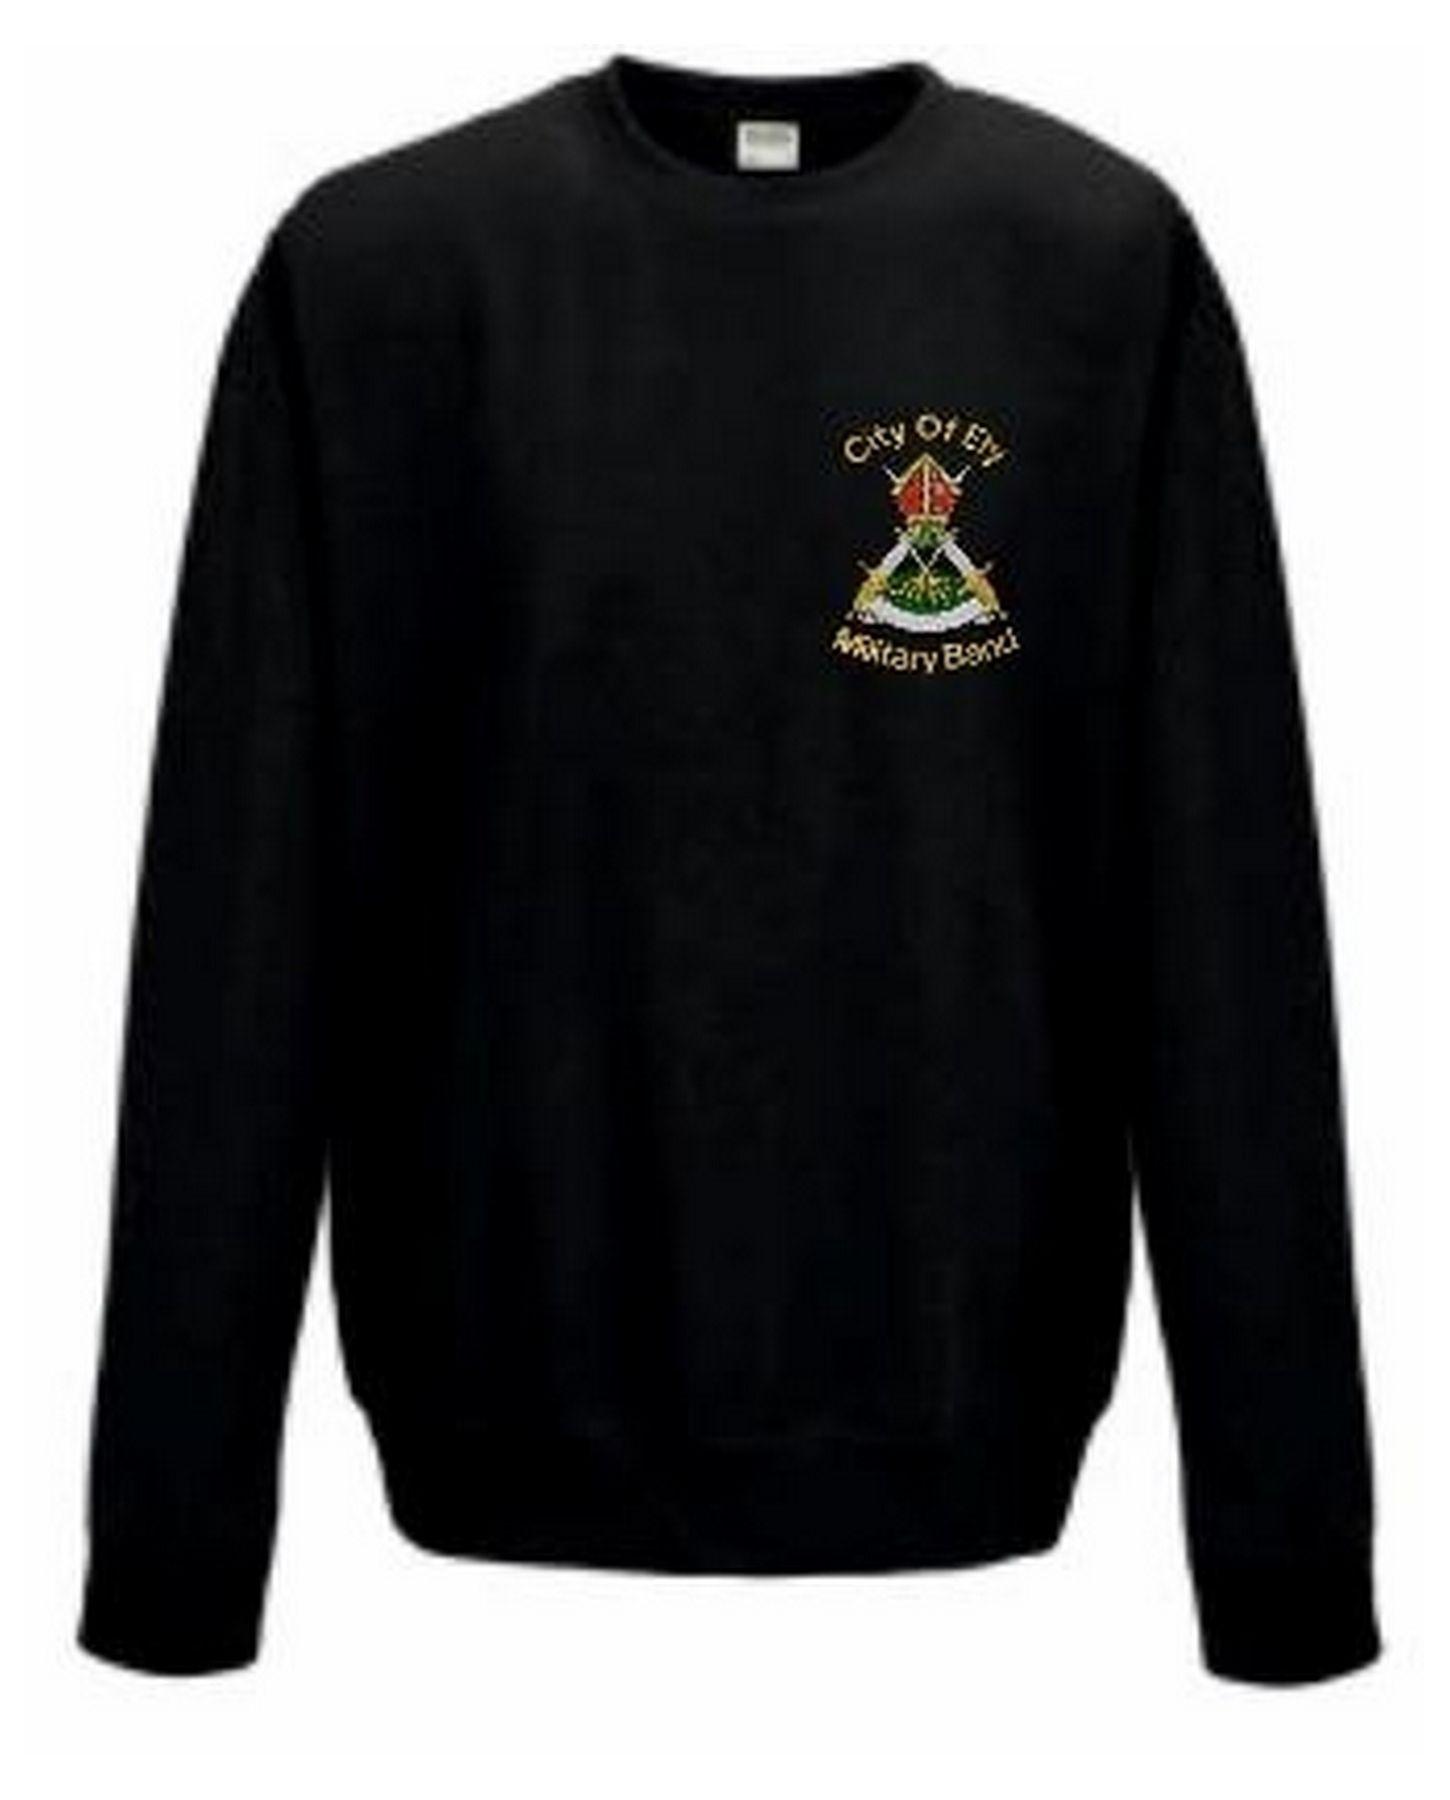 Ely Military Band – Sweatshirt